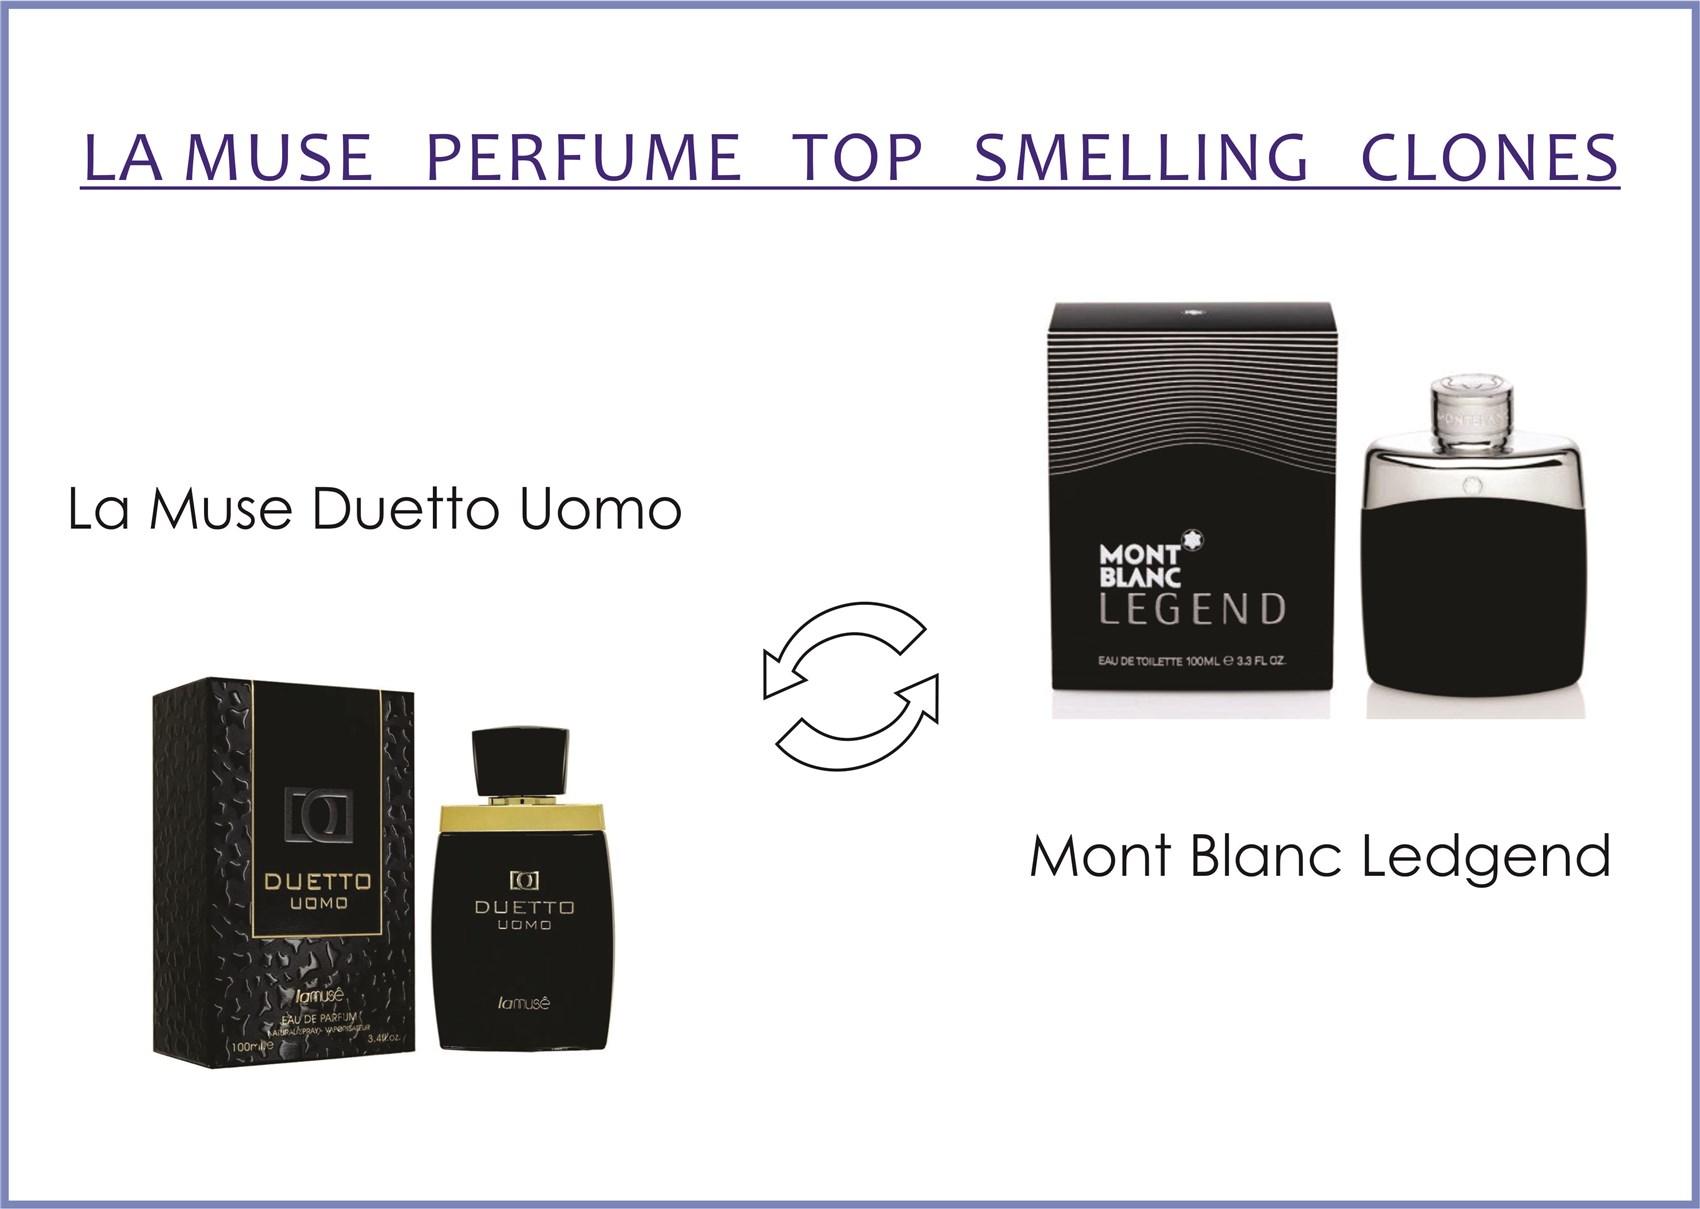 mont-blanc-legend-perfume-for-men-150-ml-edt-la-muse-duetto-uomo-perfume